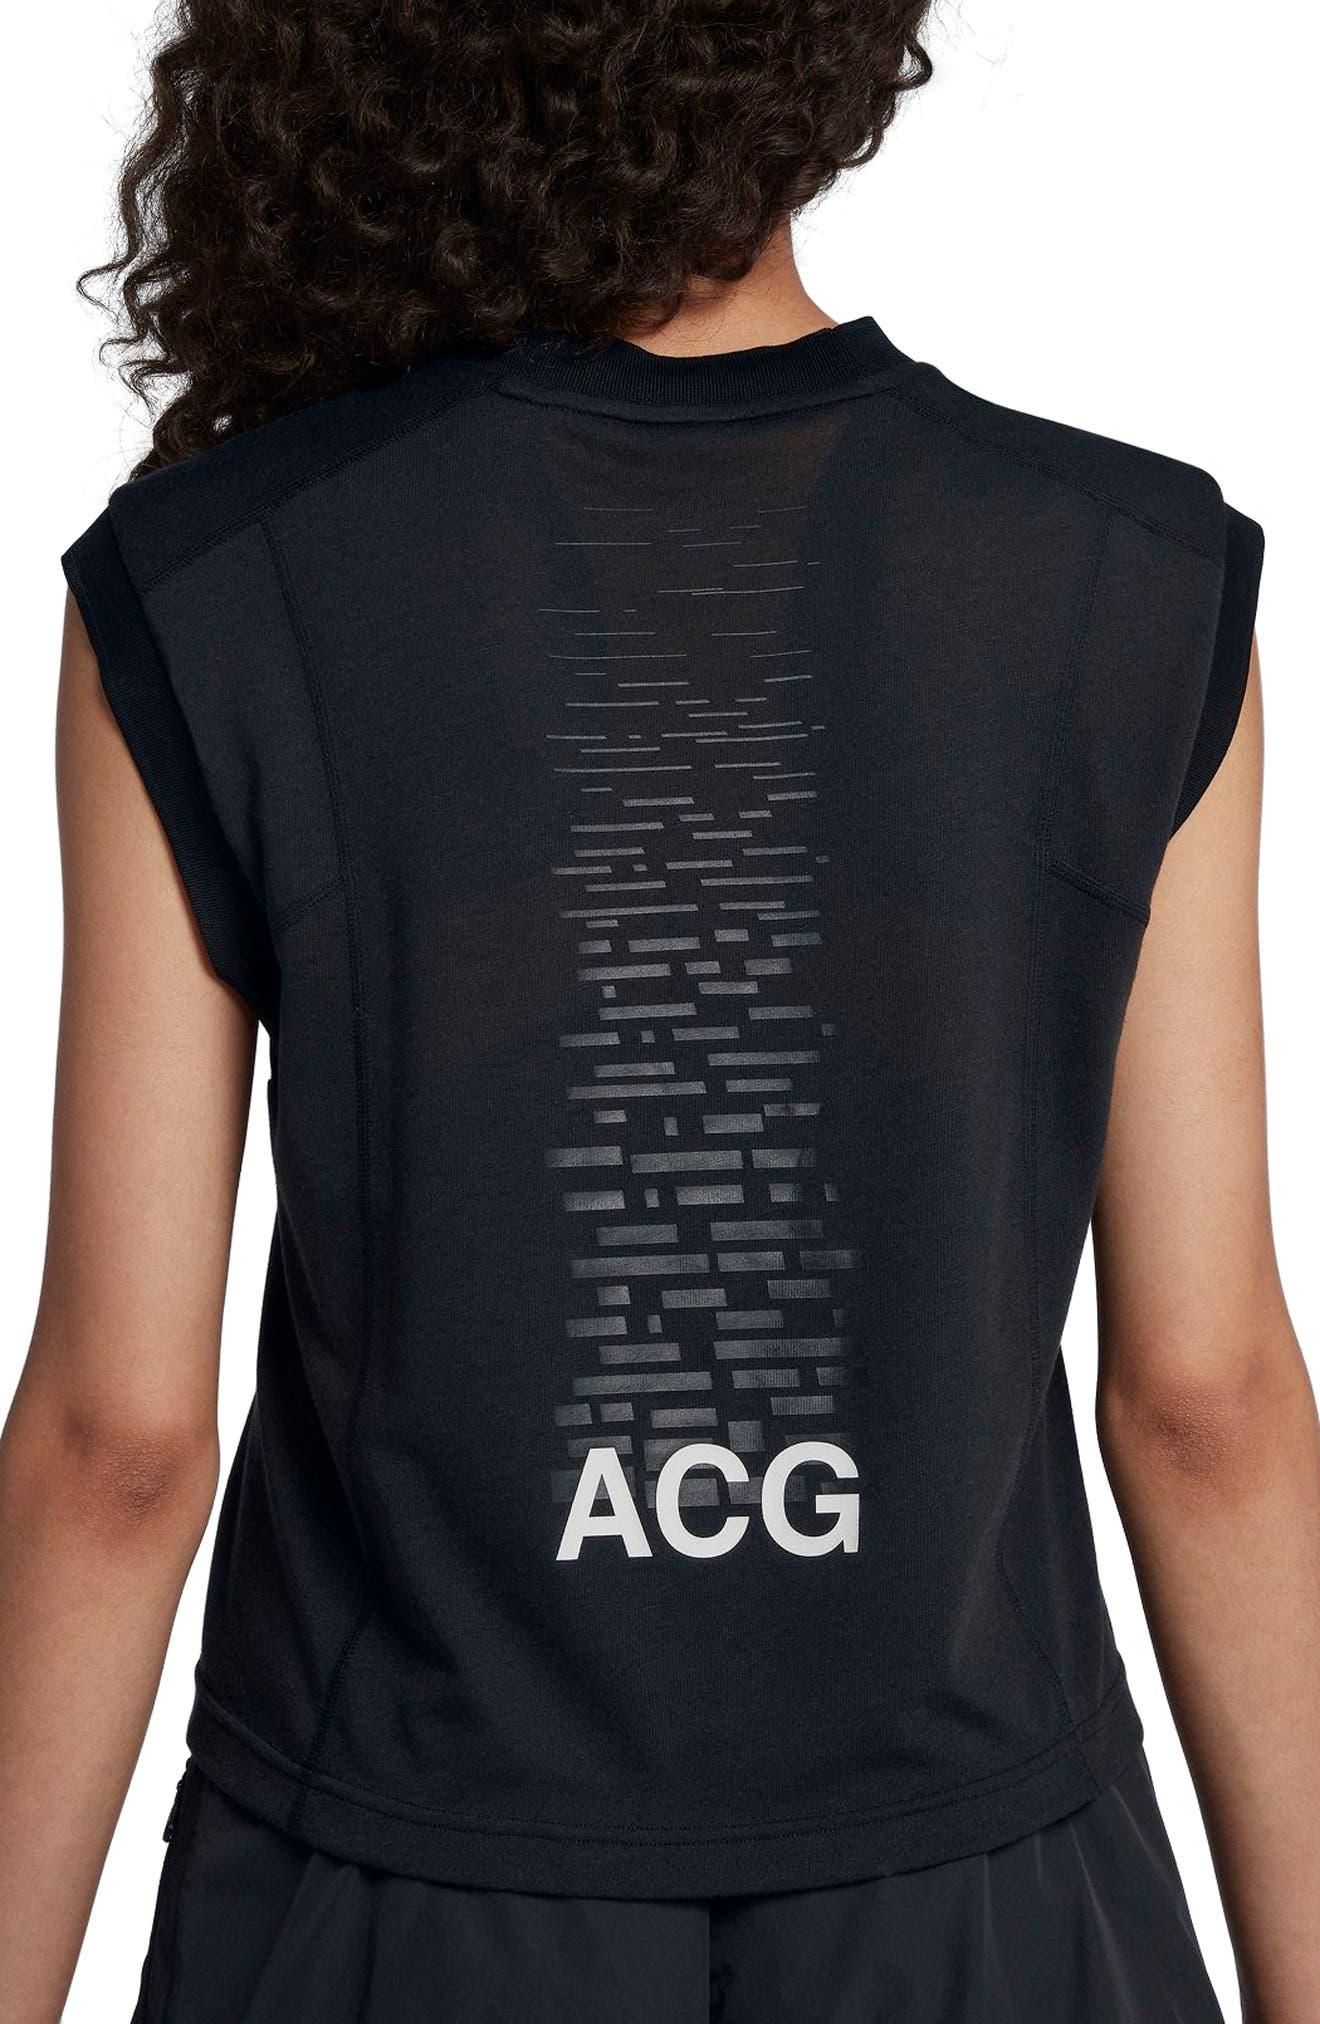 NIKE,                             NikeLab ACG Women's Sleeveless Top,                             Alternate thumbnail 2, color,                             010